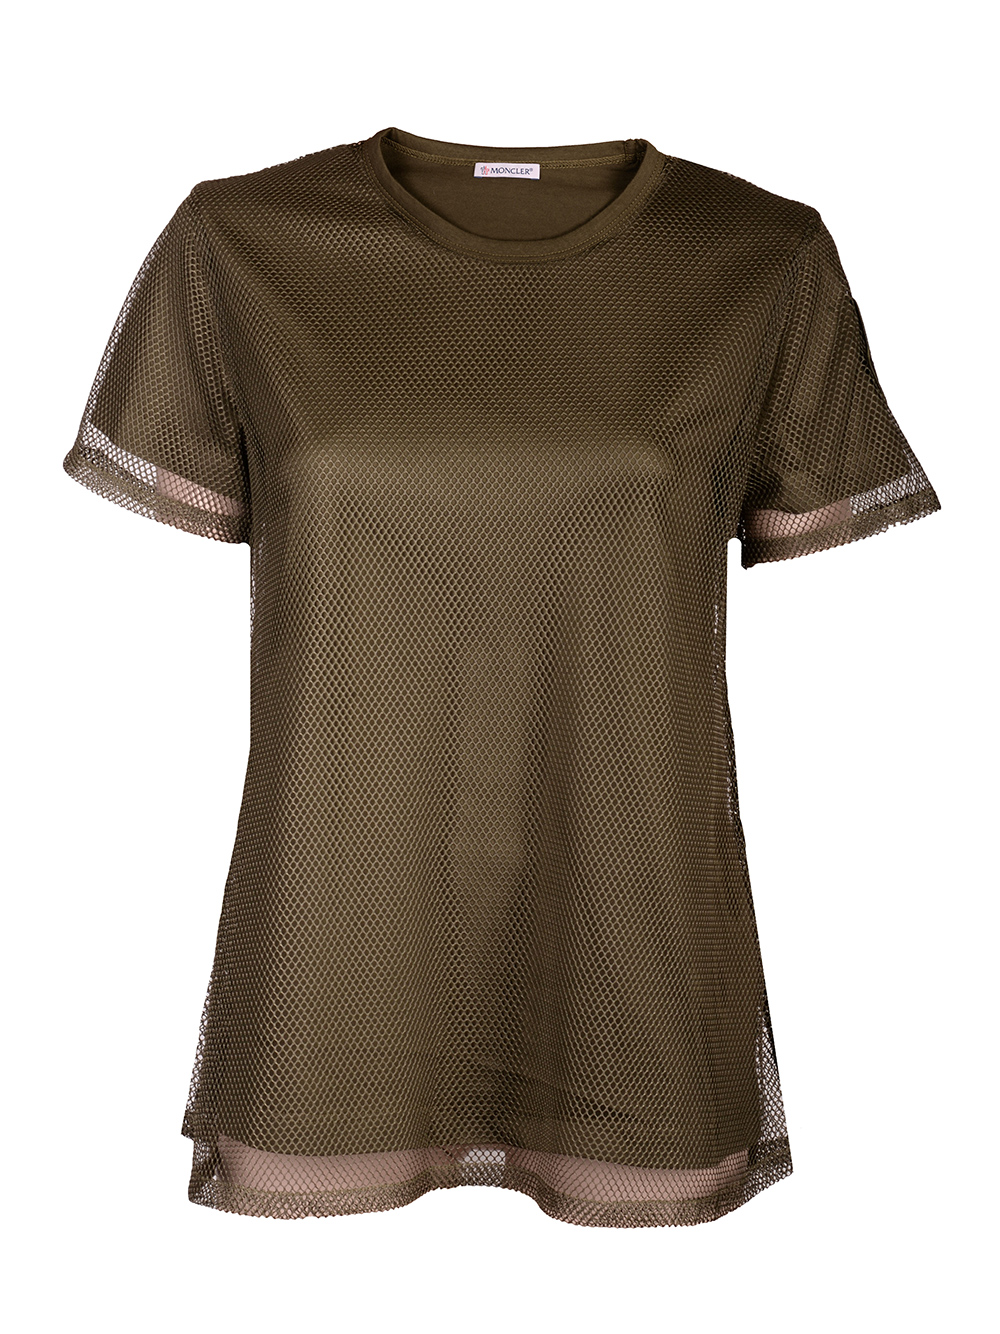 MONCLER Μπλούζα T-Shirt F10938C73500V8123 ΧΑΚΙ